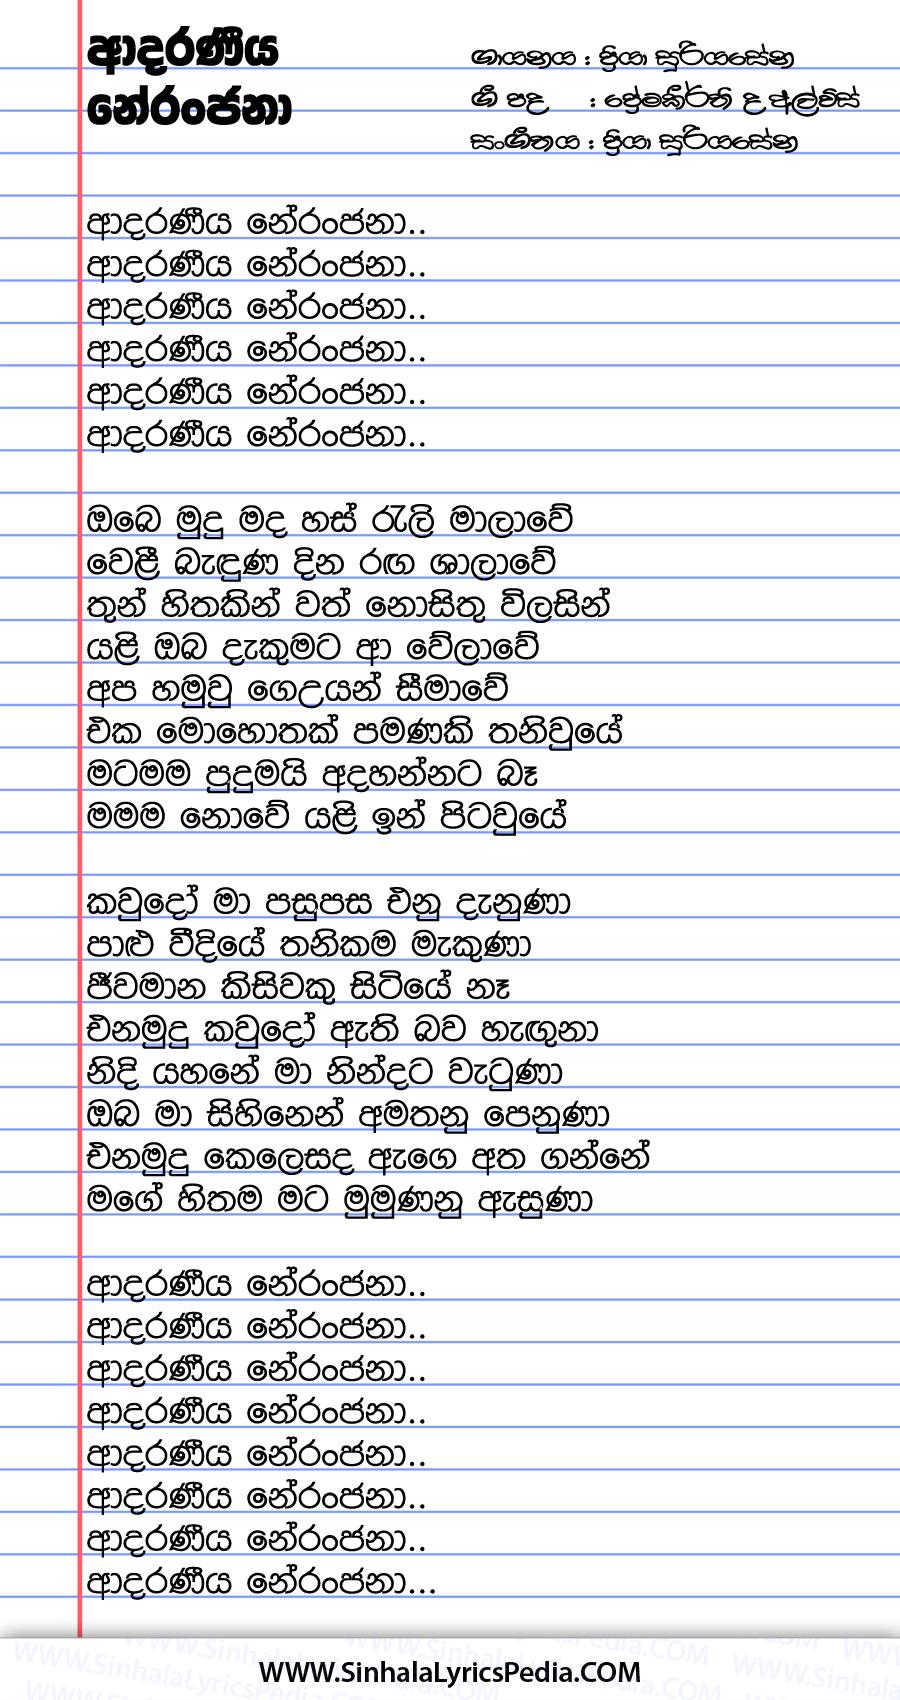 Adaraneeya Neranjana Song Lyrics